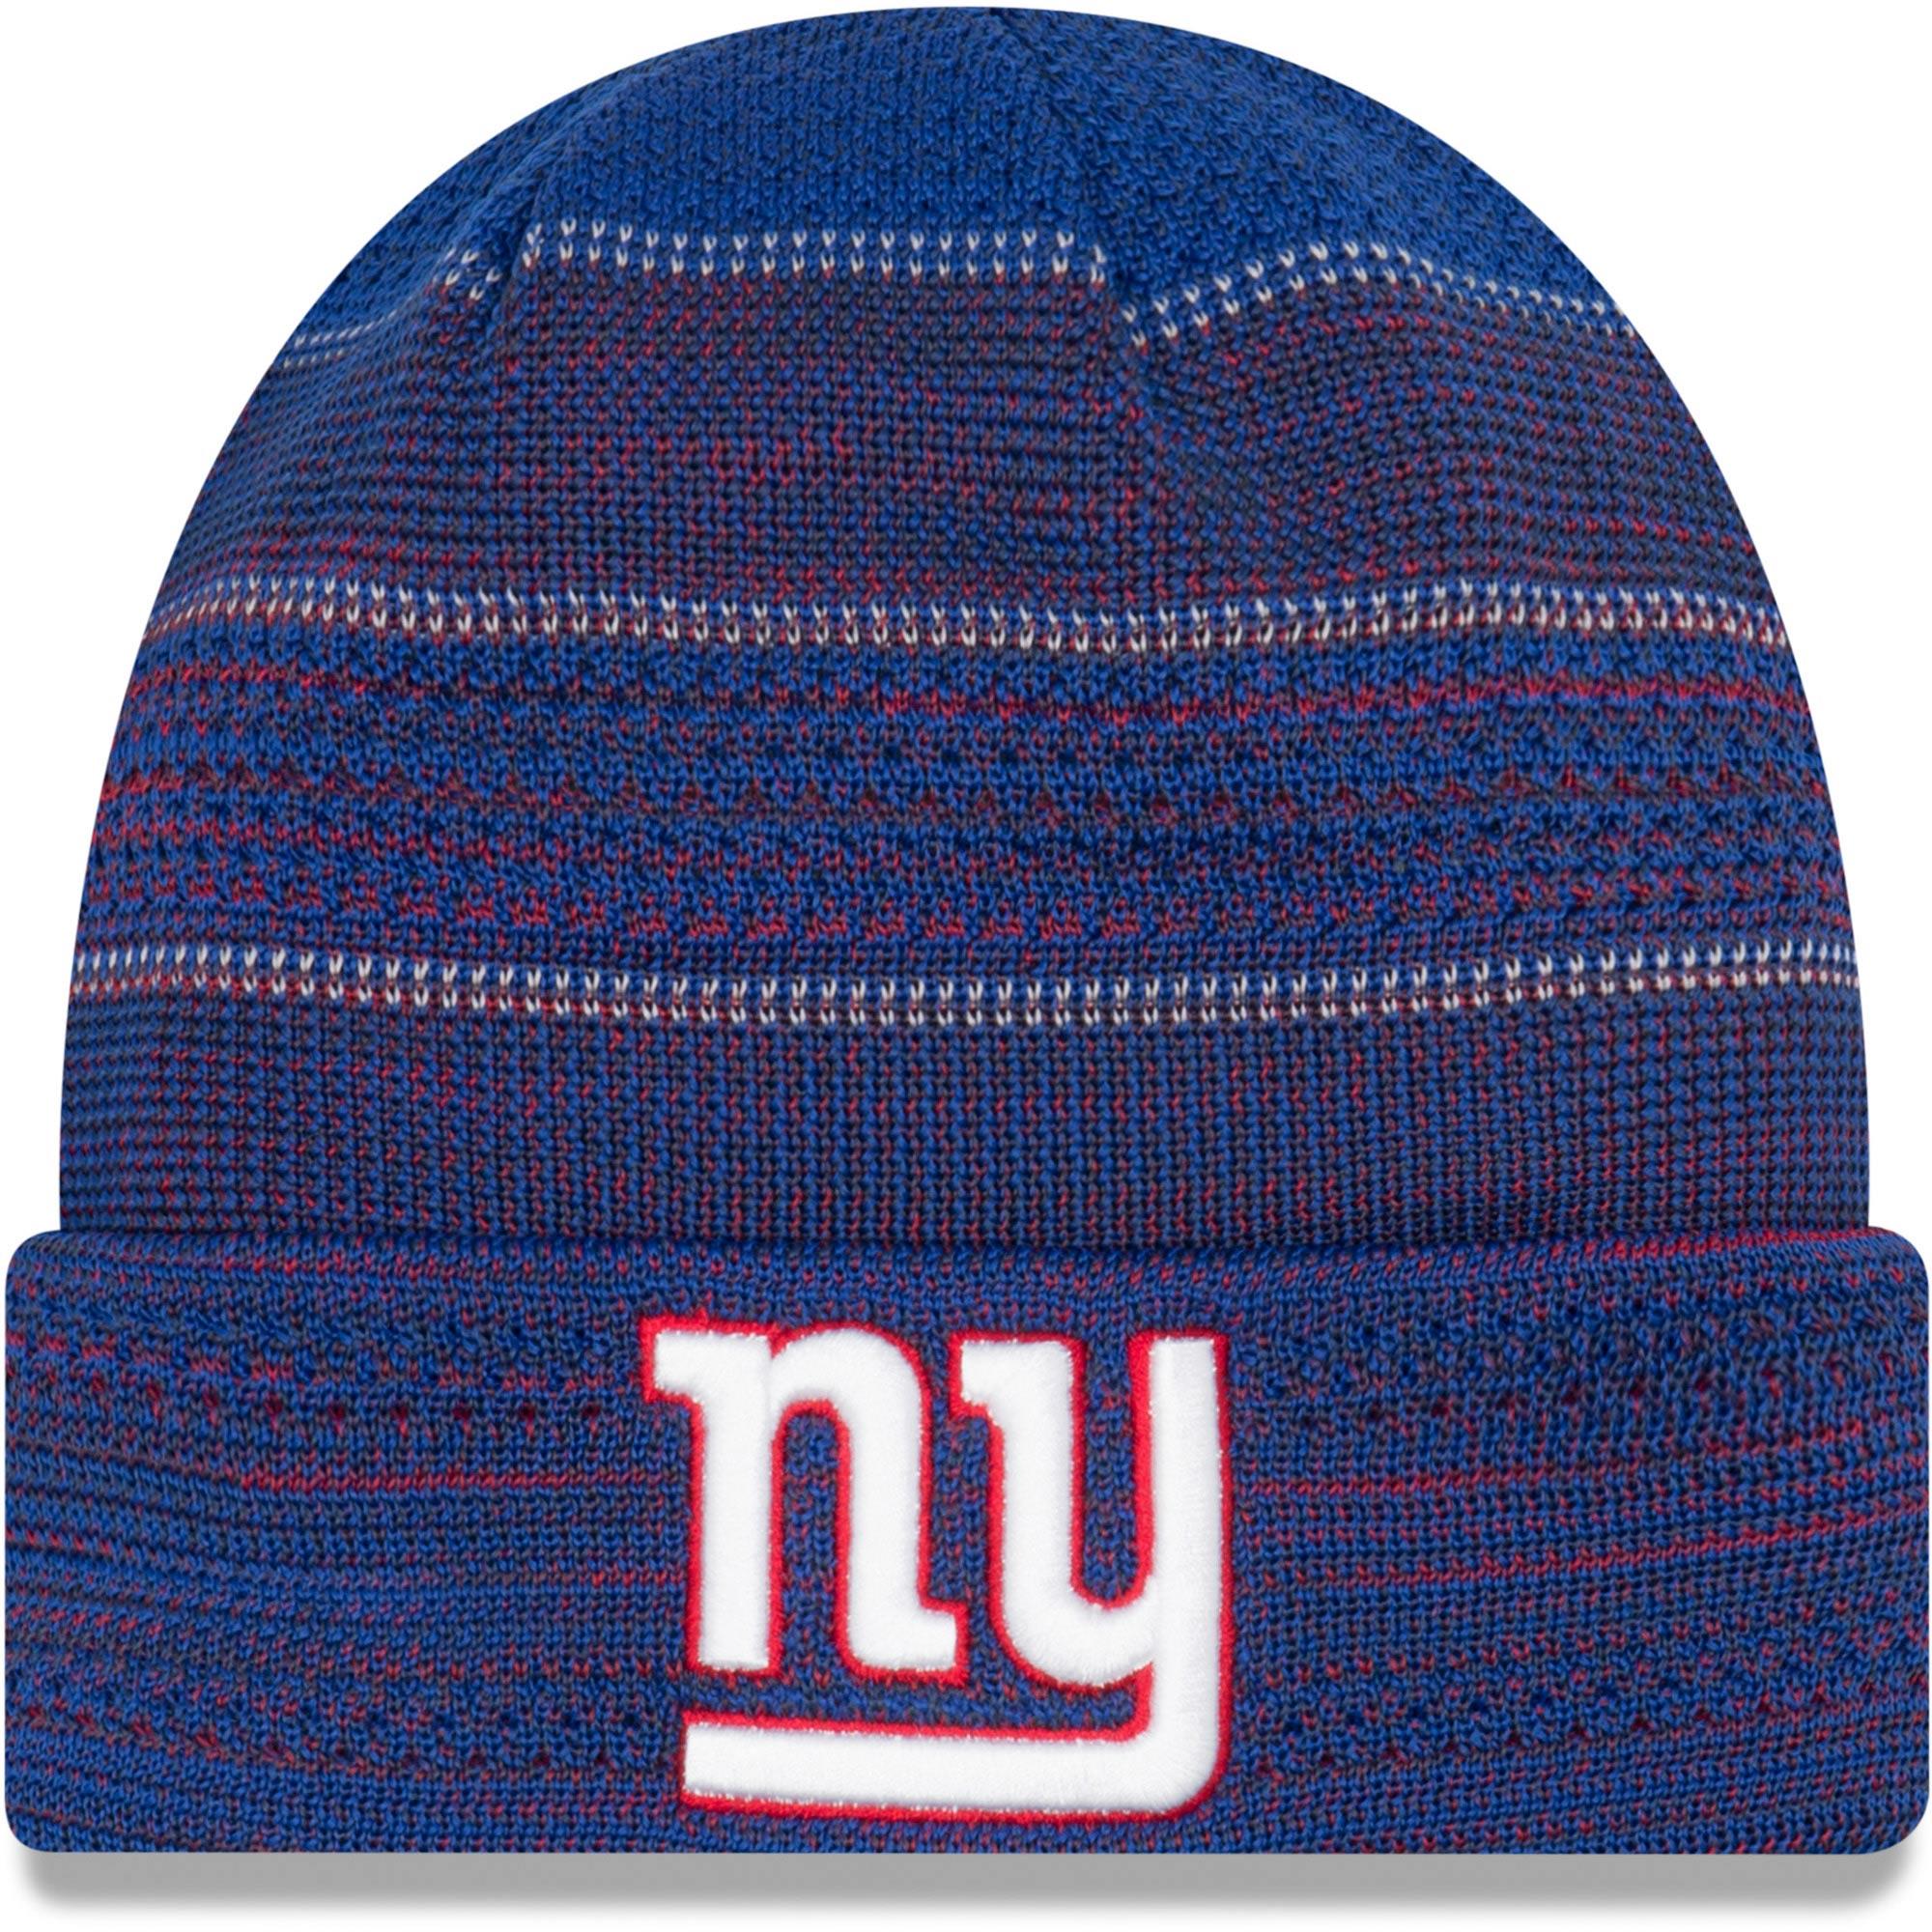 New York Giants New Era 2017 Sideline Official TD Knit Hat - Royal